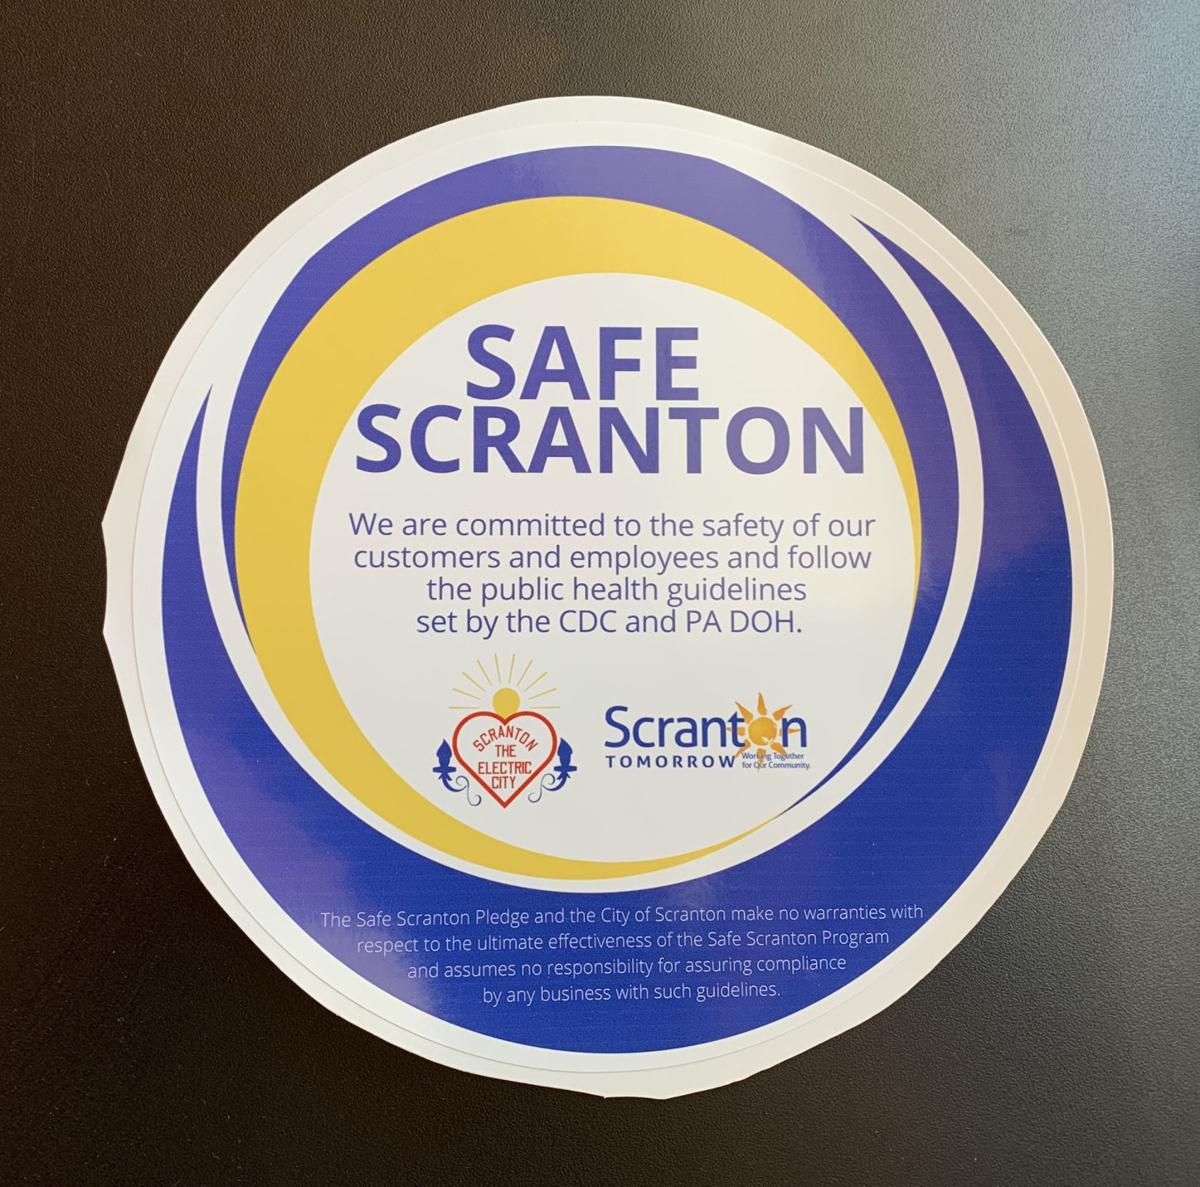 Scranton businesses encouraged to pledge safe practices